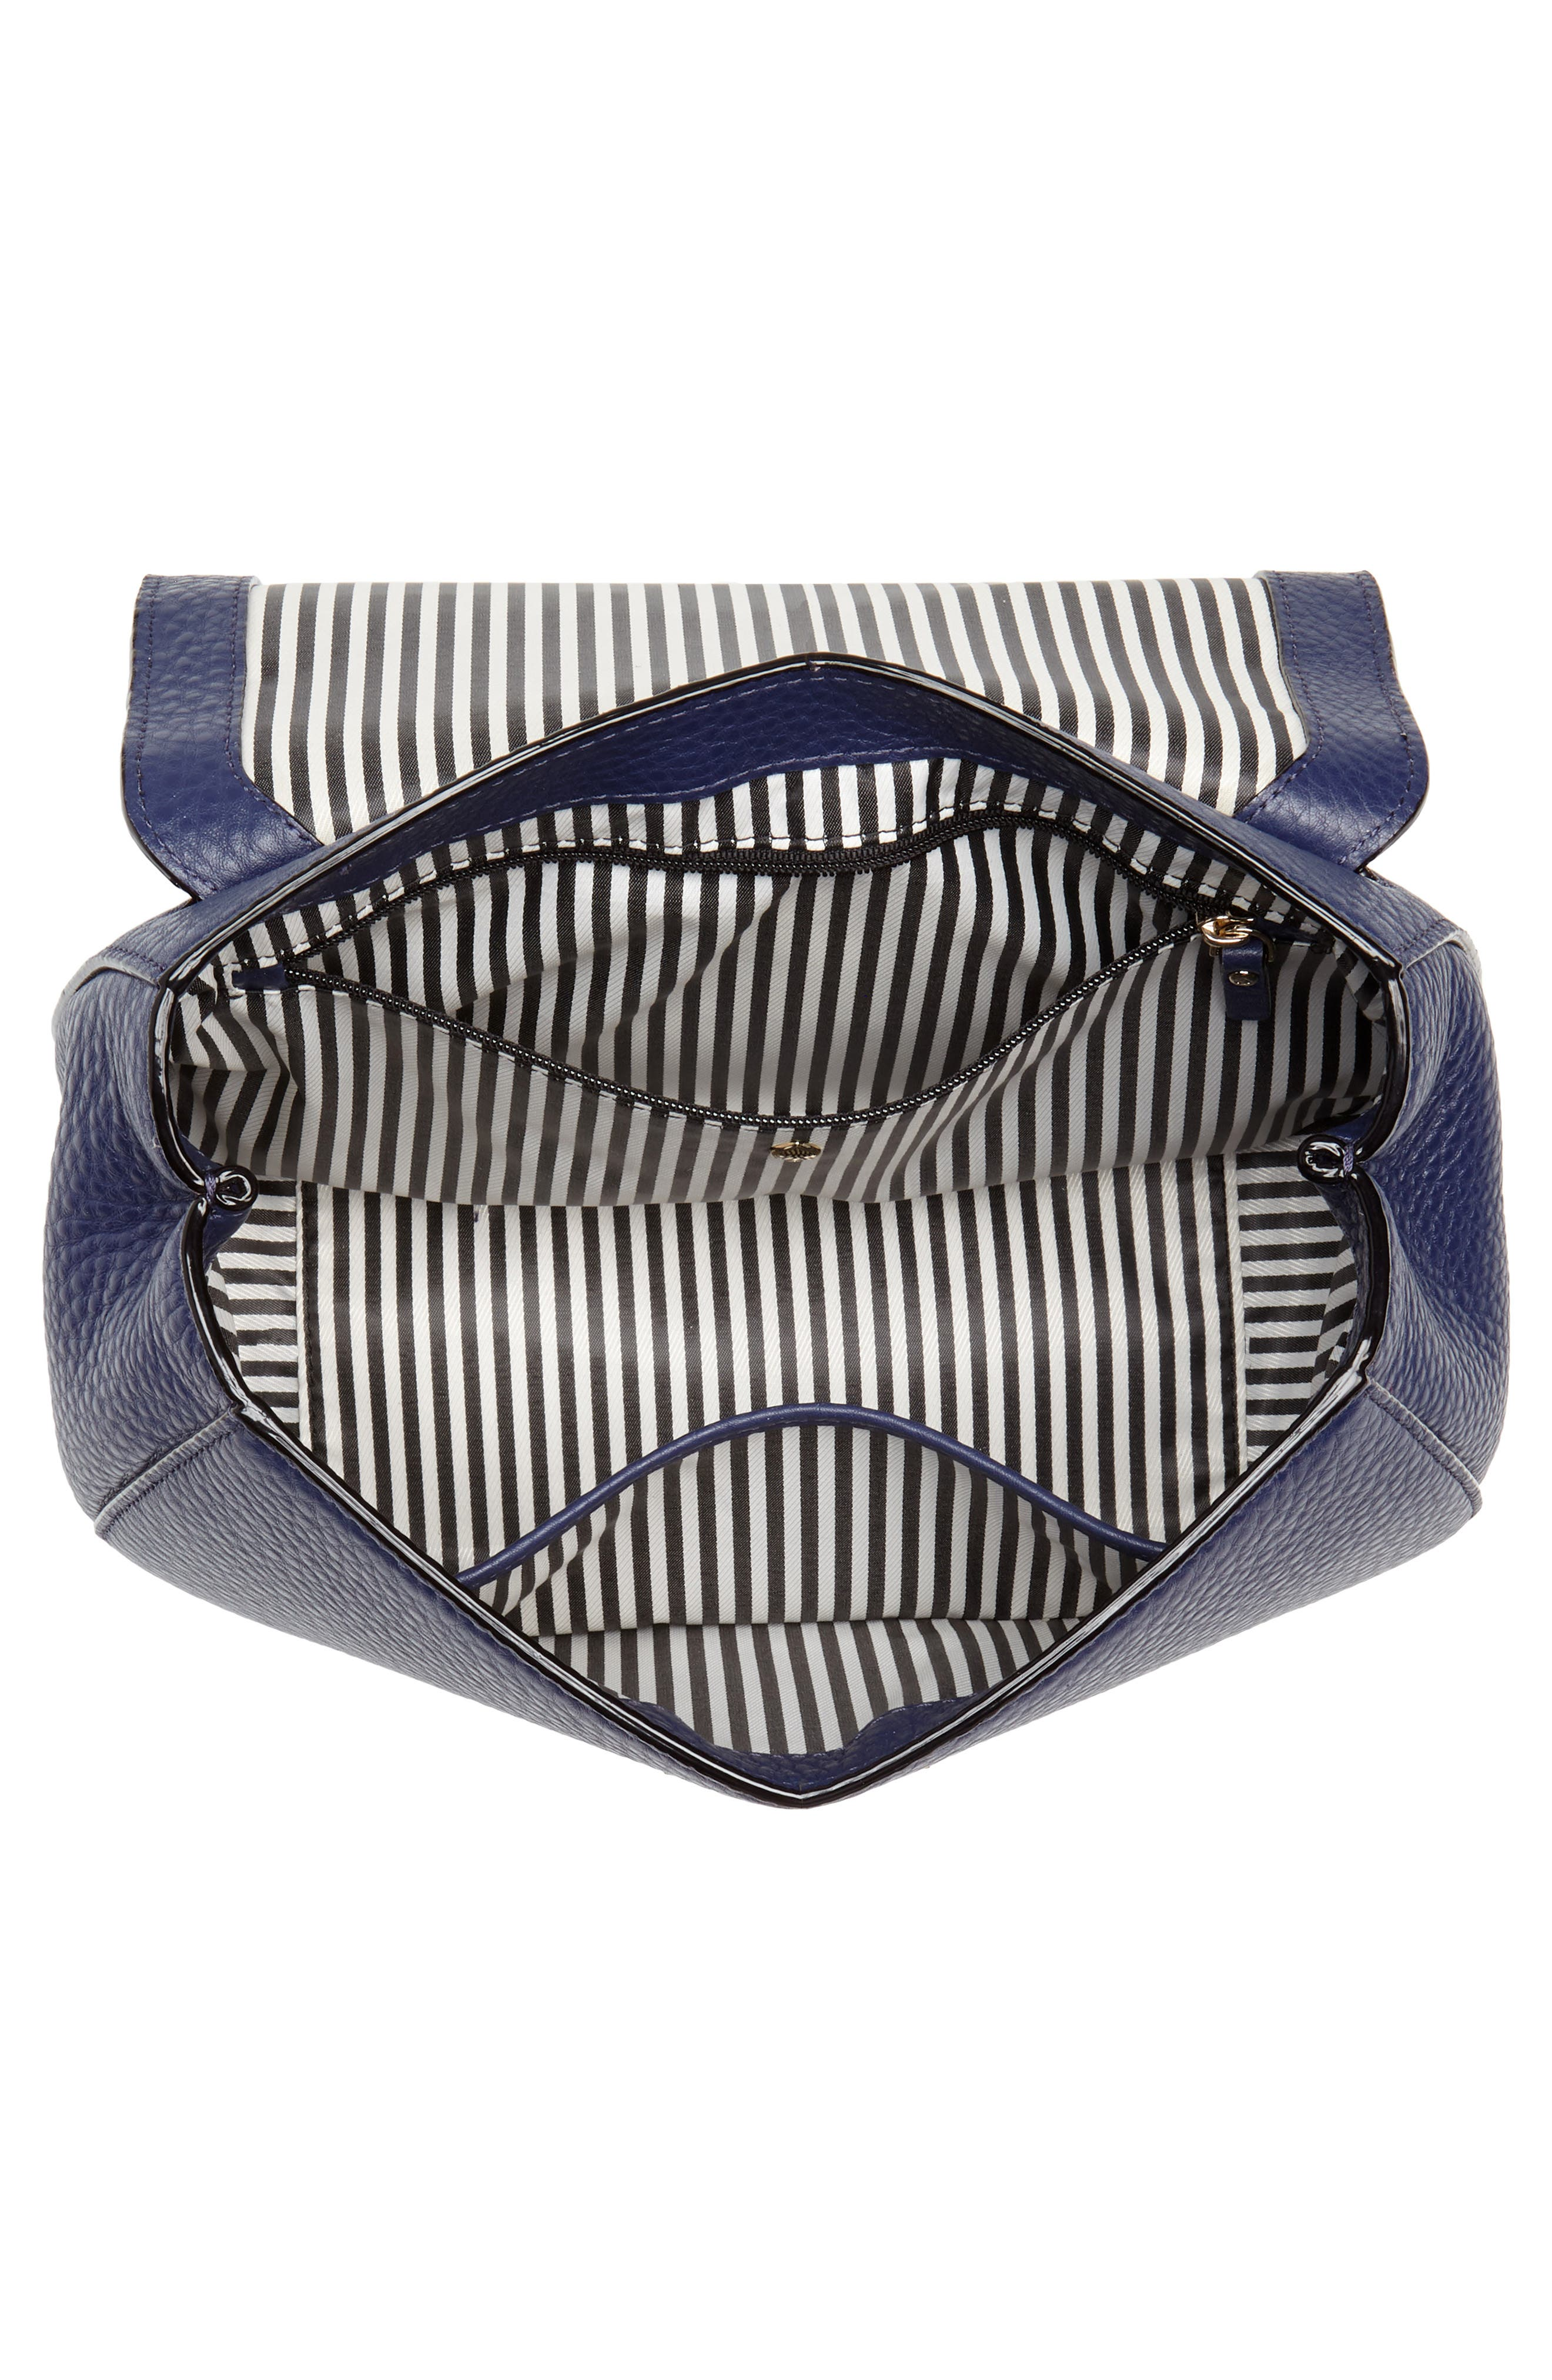 carlyle street - justina leather satchel,                             Alternate thumbnail 4, color,                             Blue Ridge